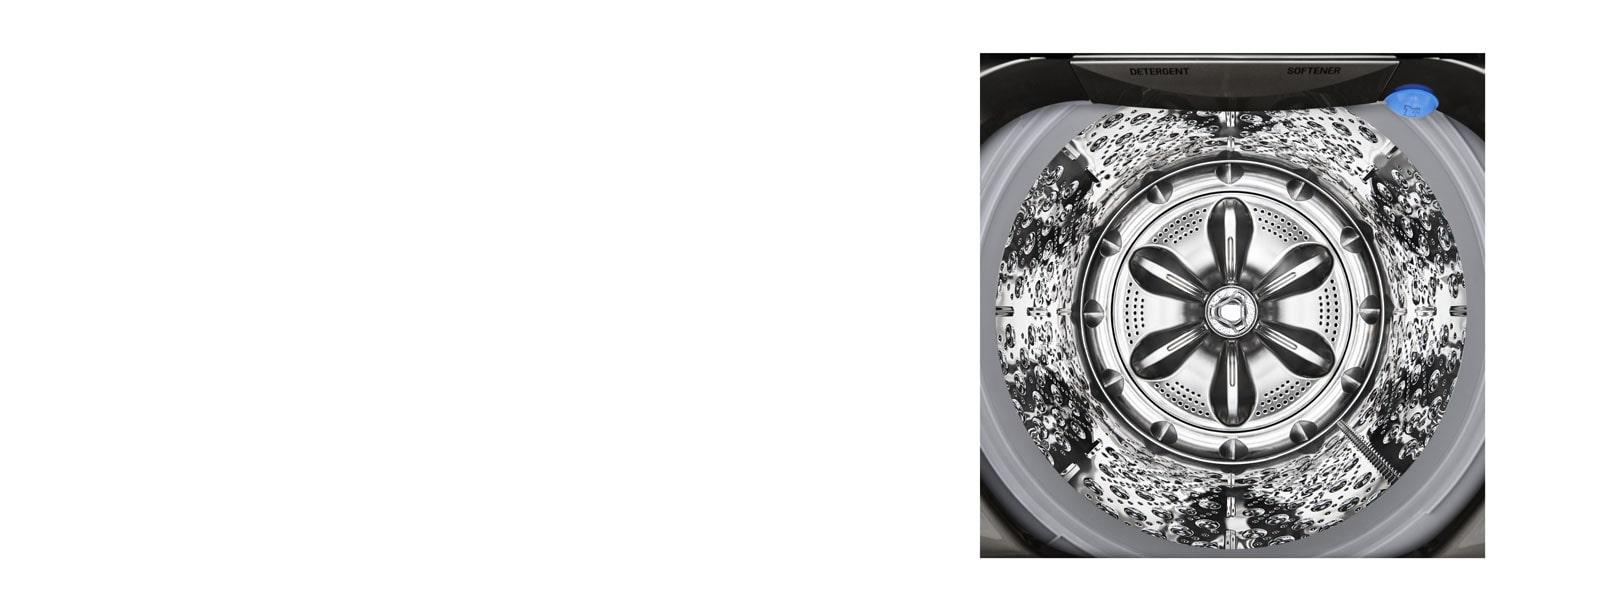 LG Stainless Steel Tub